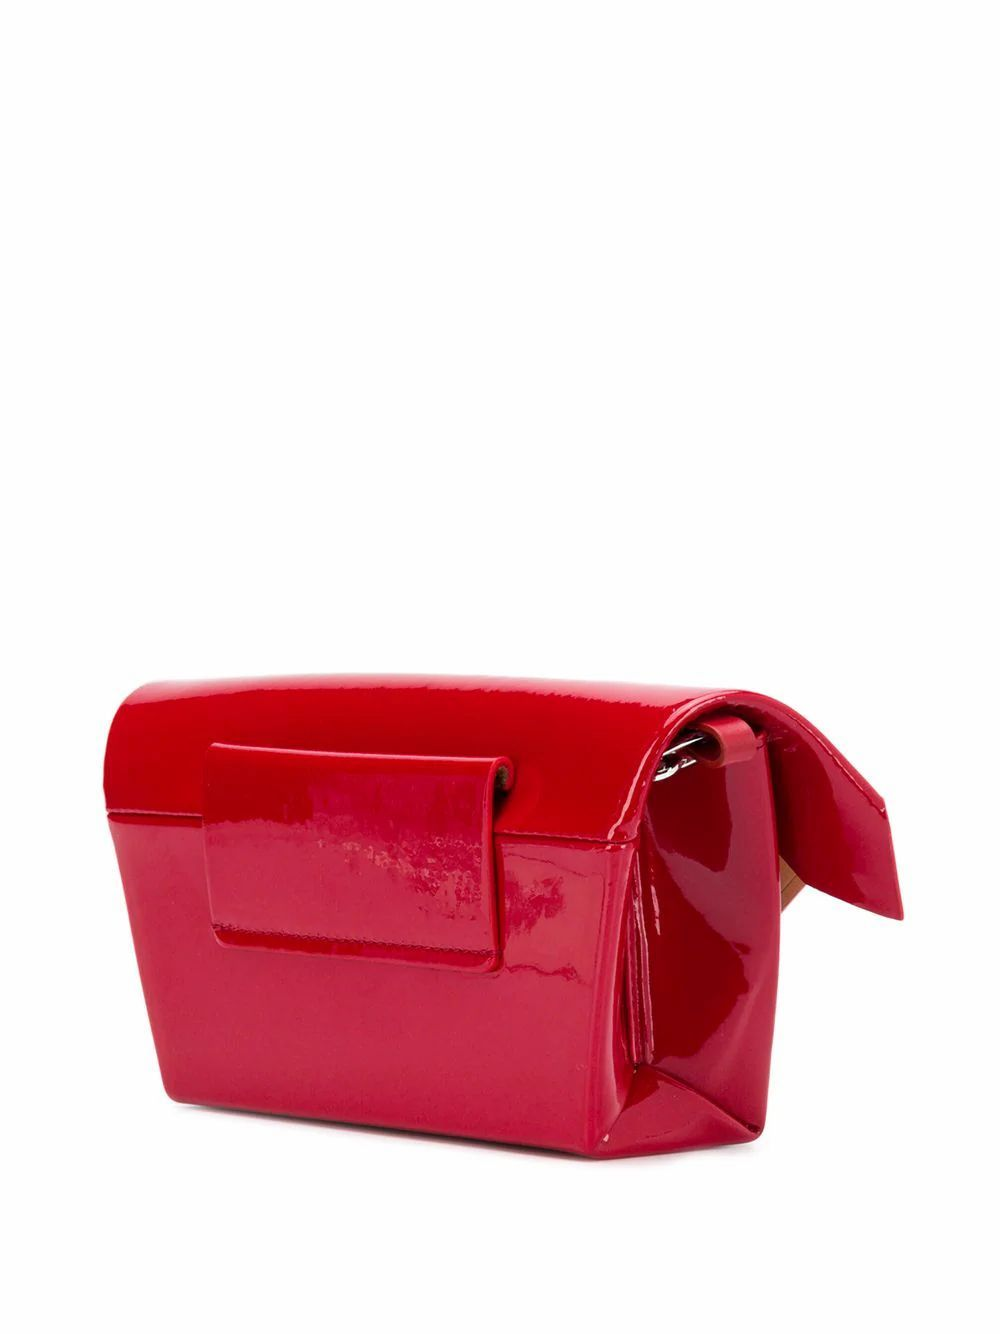 MAISON MARGIELA WOMEN'S S61WF0025PR035T4045 RED LEATHER SHOULDER BAG